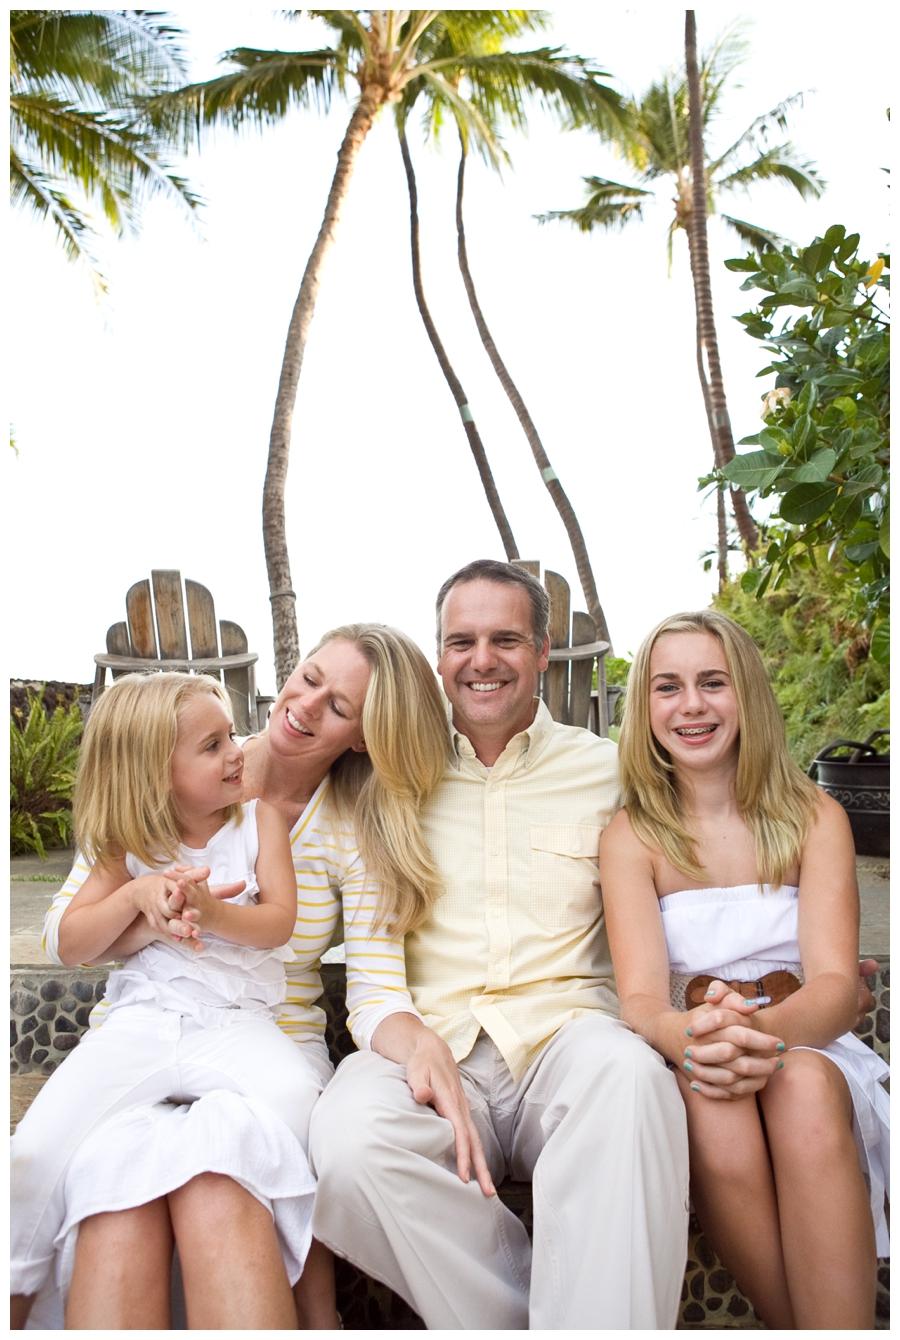 sandiegofamilyphotography-137.jpg